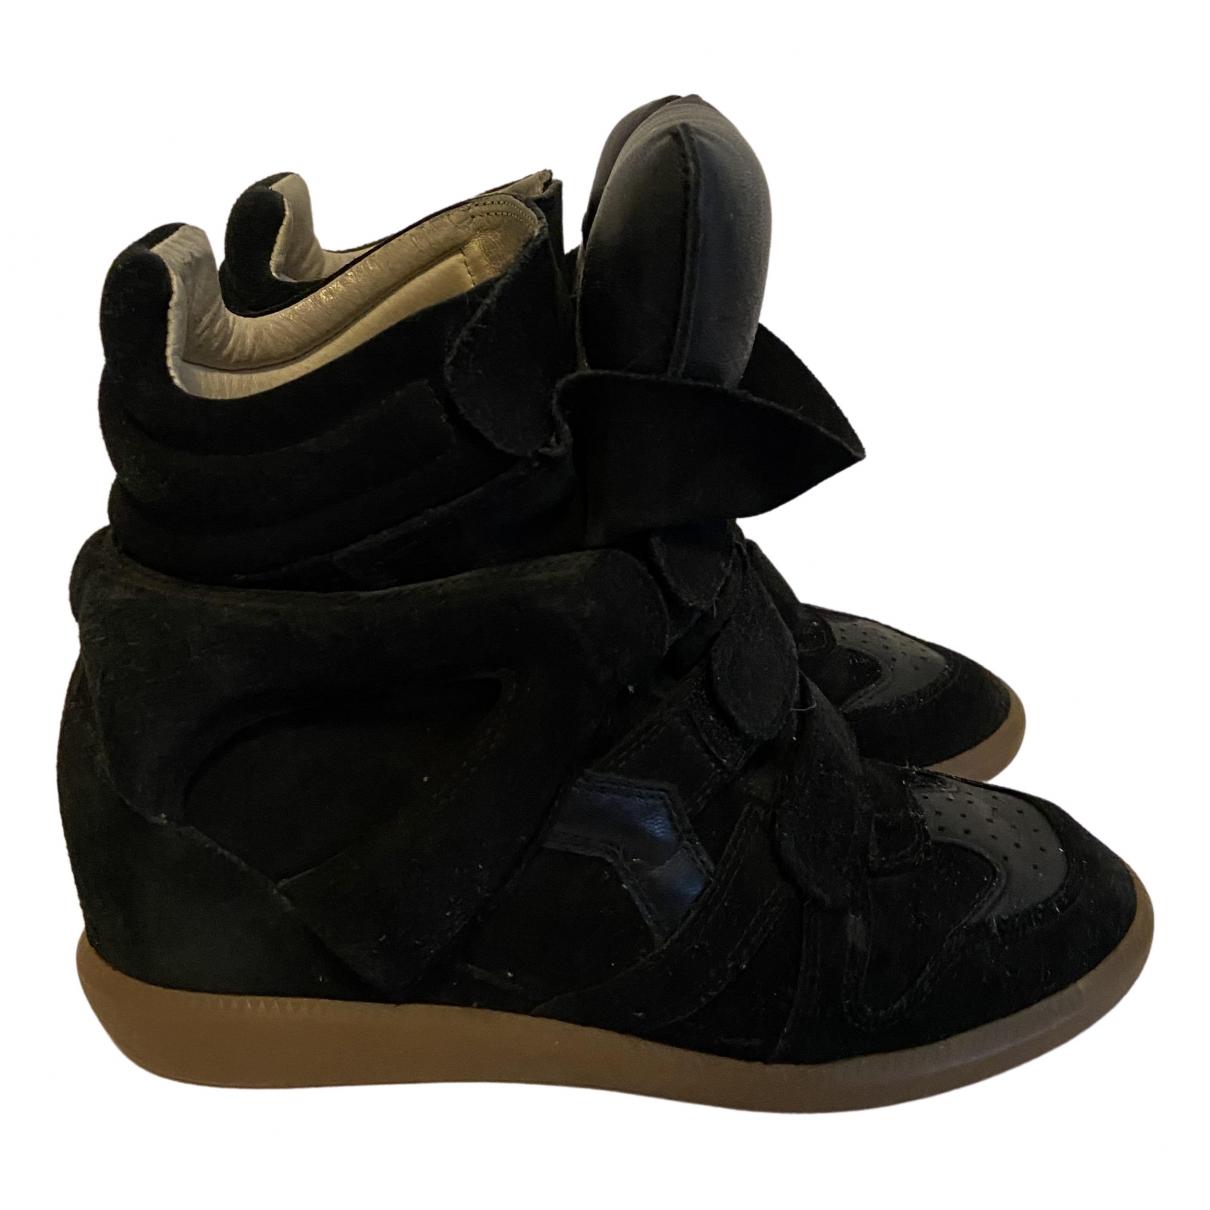 Isabel Marant - Baskets Beckett pour femme en suede - noir